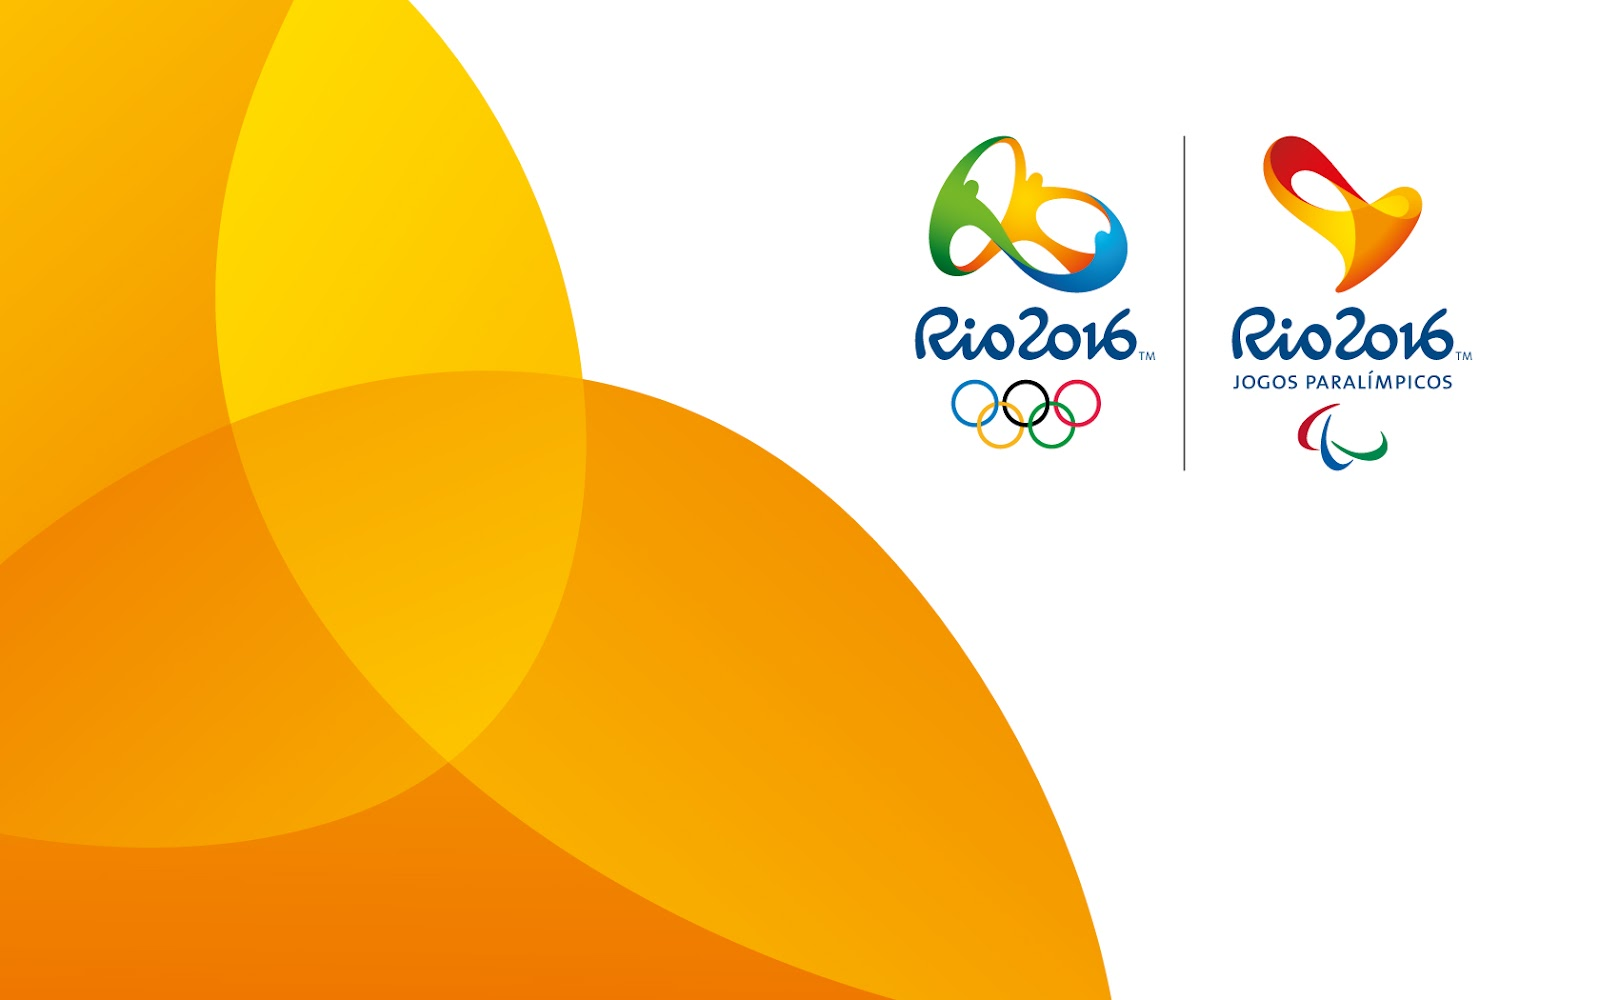 Papel de parede das Olimpíadas de 2016